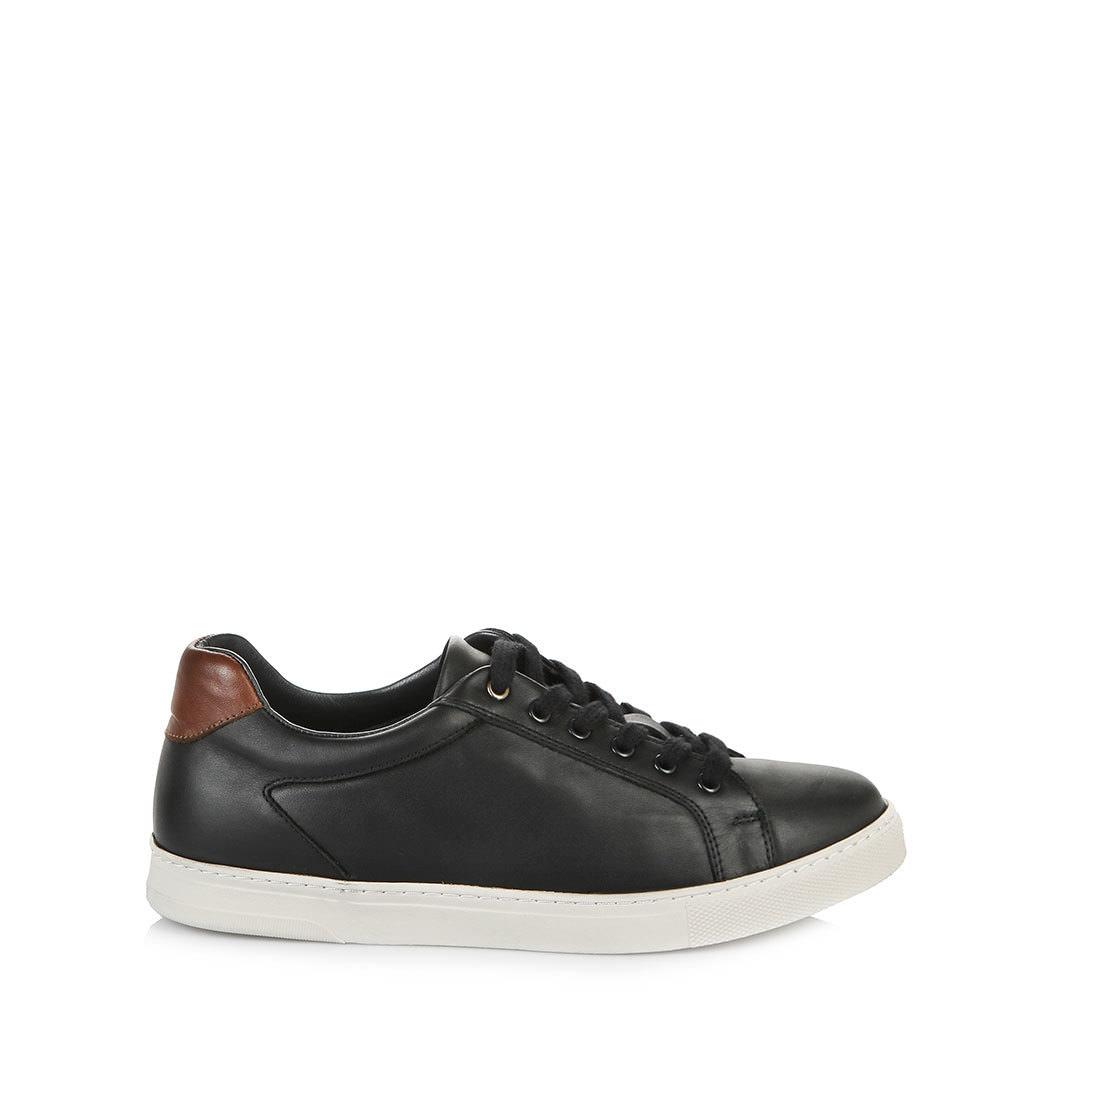 huge selection of a3995 015ac Buffalo Herren-Sneaker in schwarz mit weißer Sohle online ...